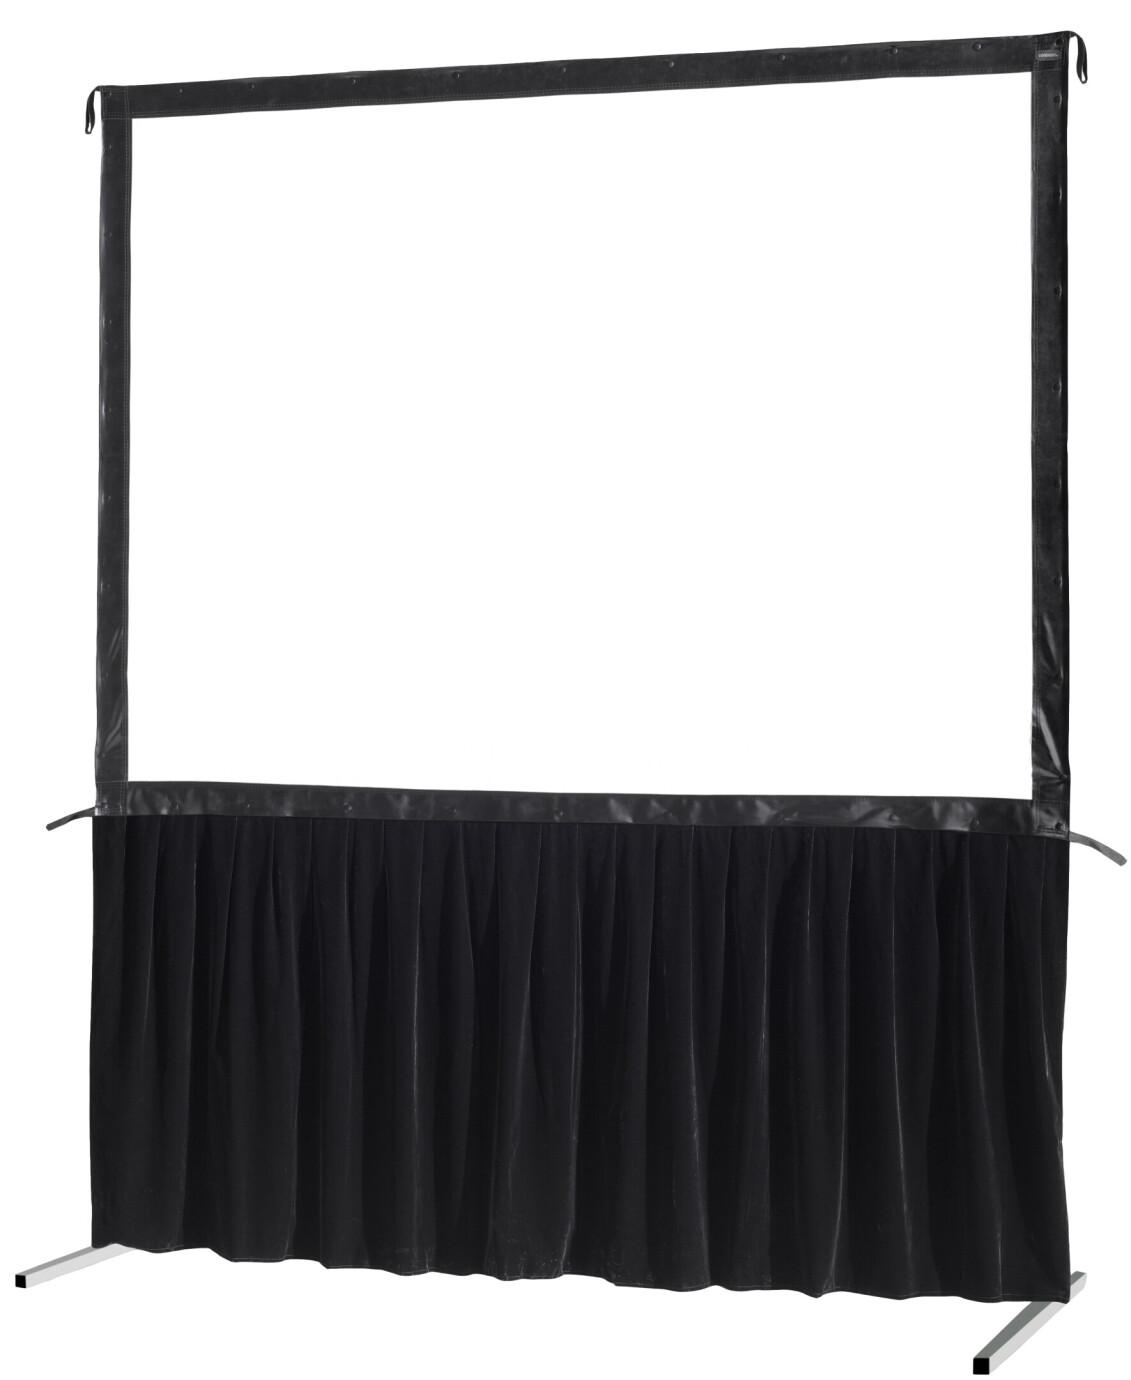 celexon Vorhangset 1-seitig für Faltrahmenleinwand Mobil Expert 244 x 137 cm